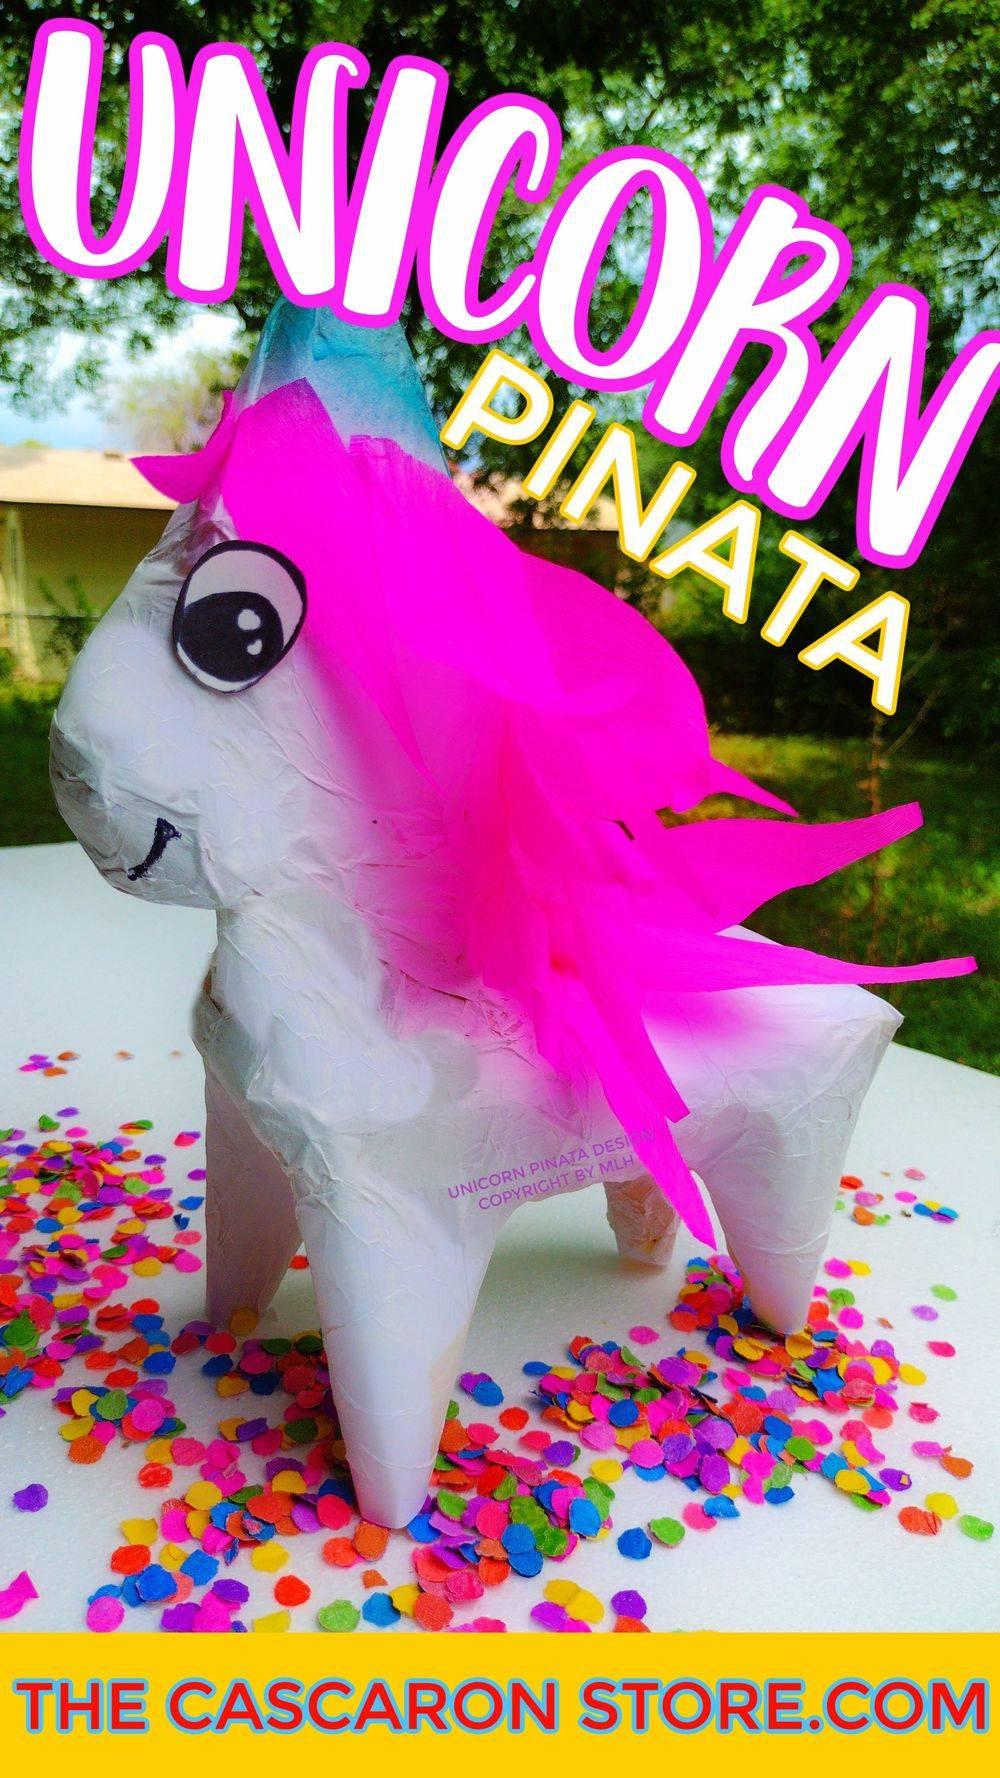 unicorn piñata birthday party decorations